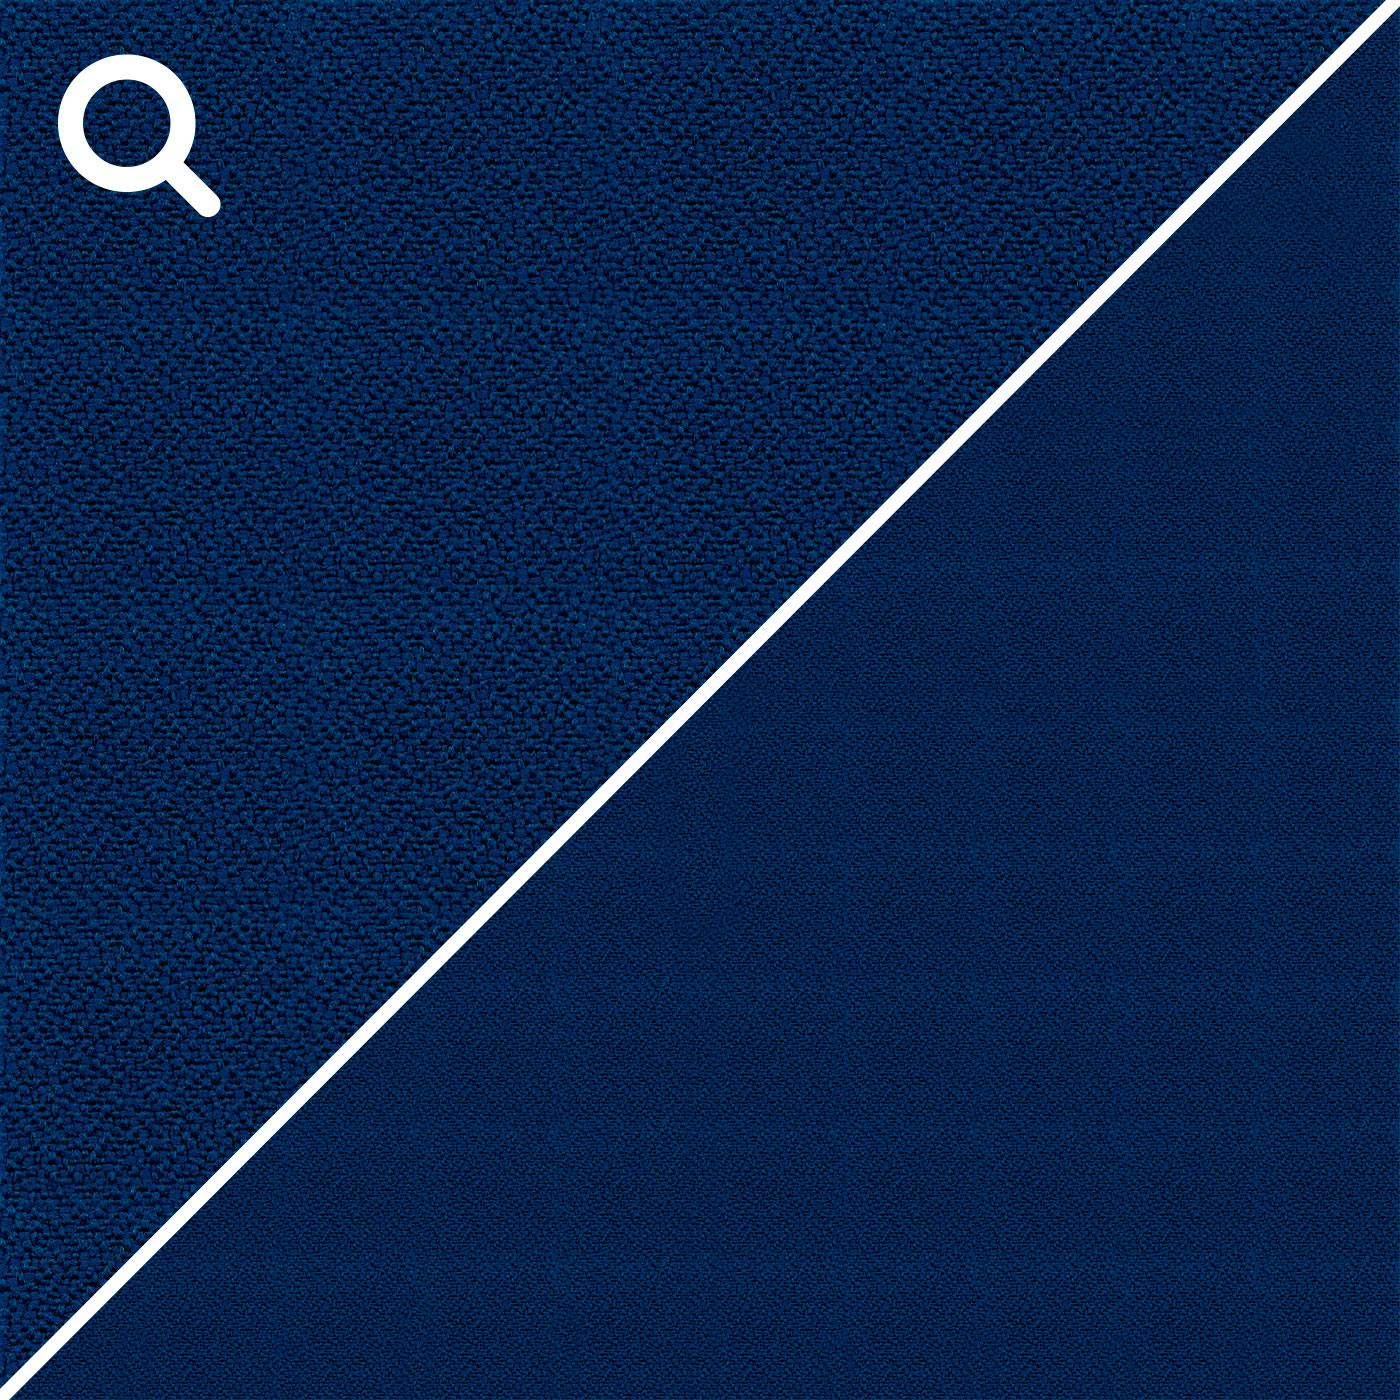 0-38-blau